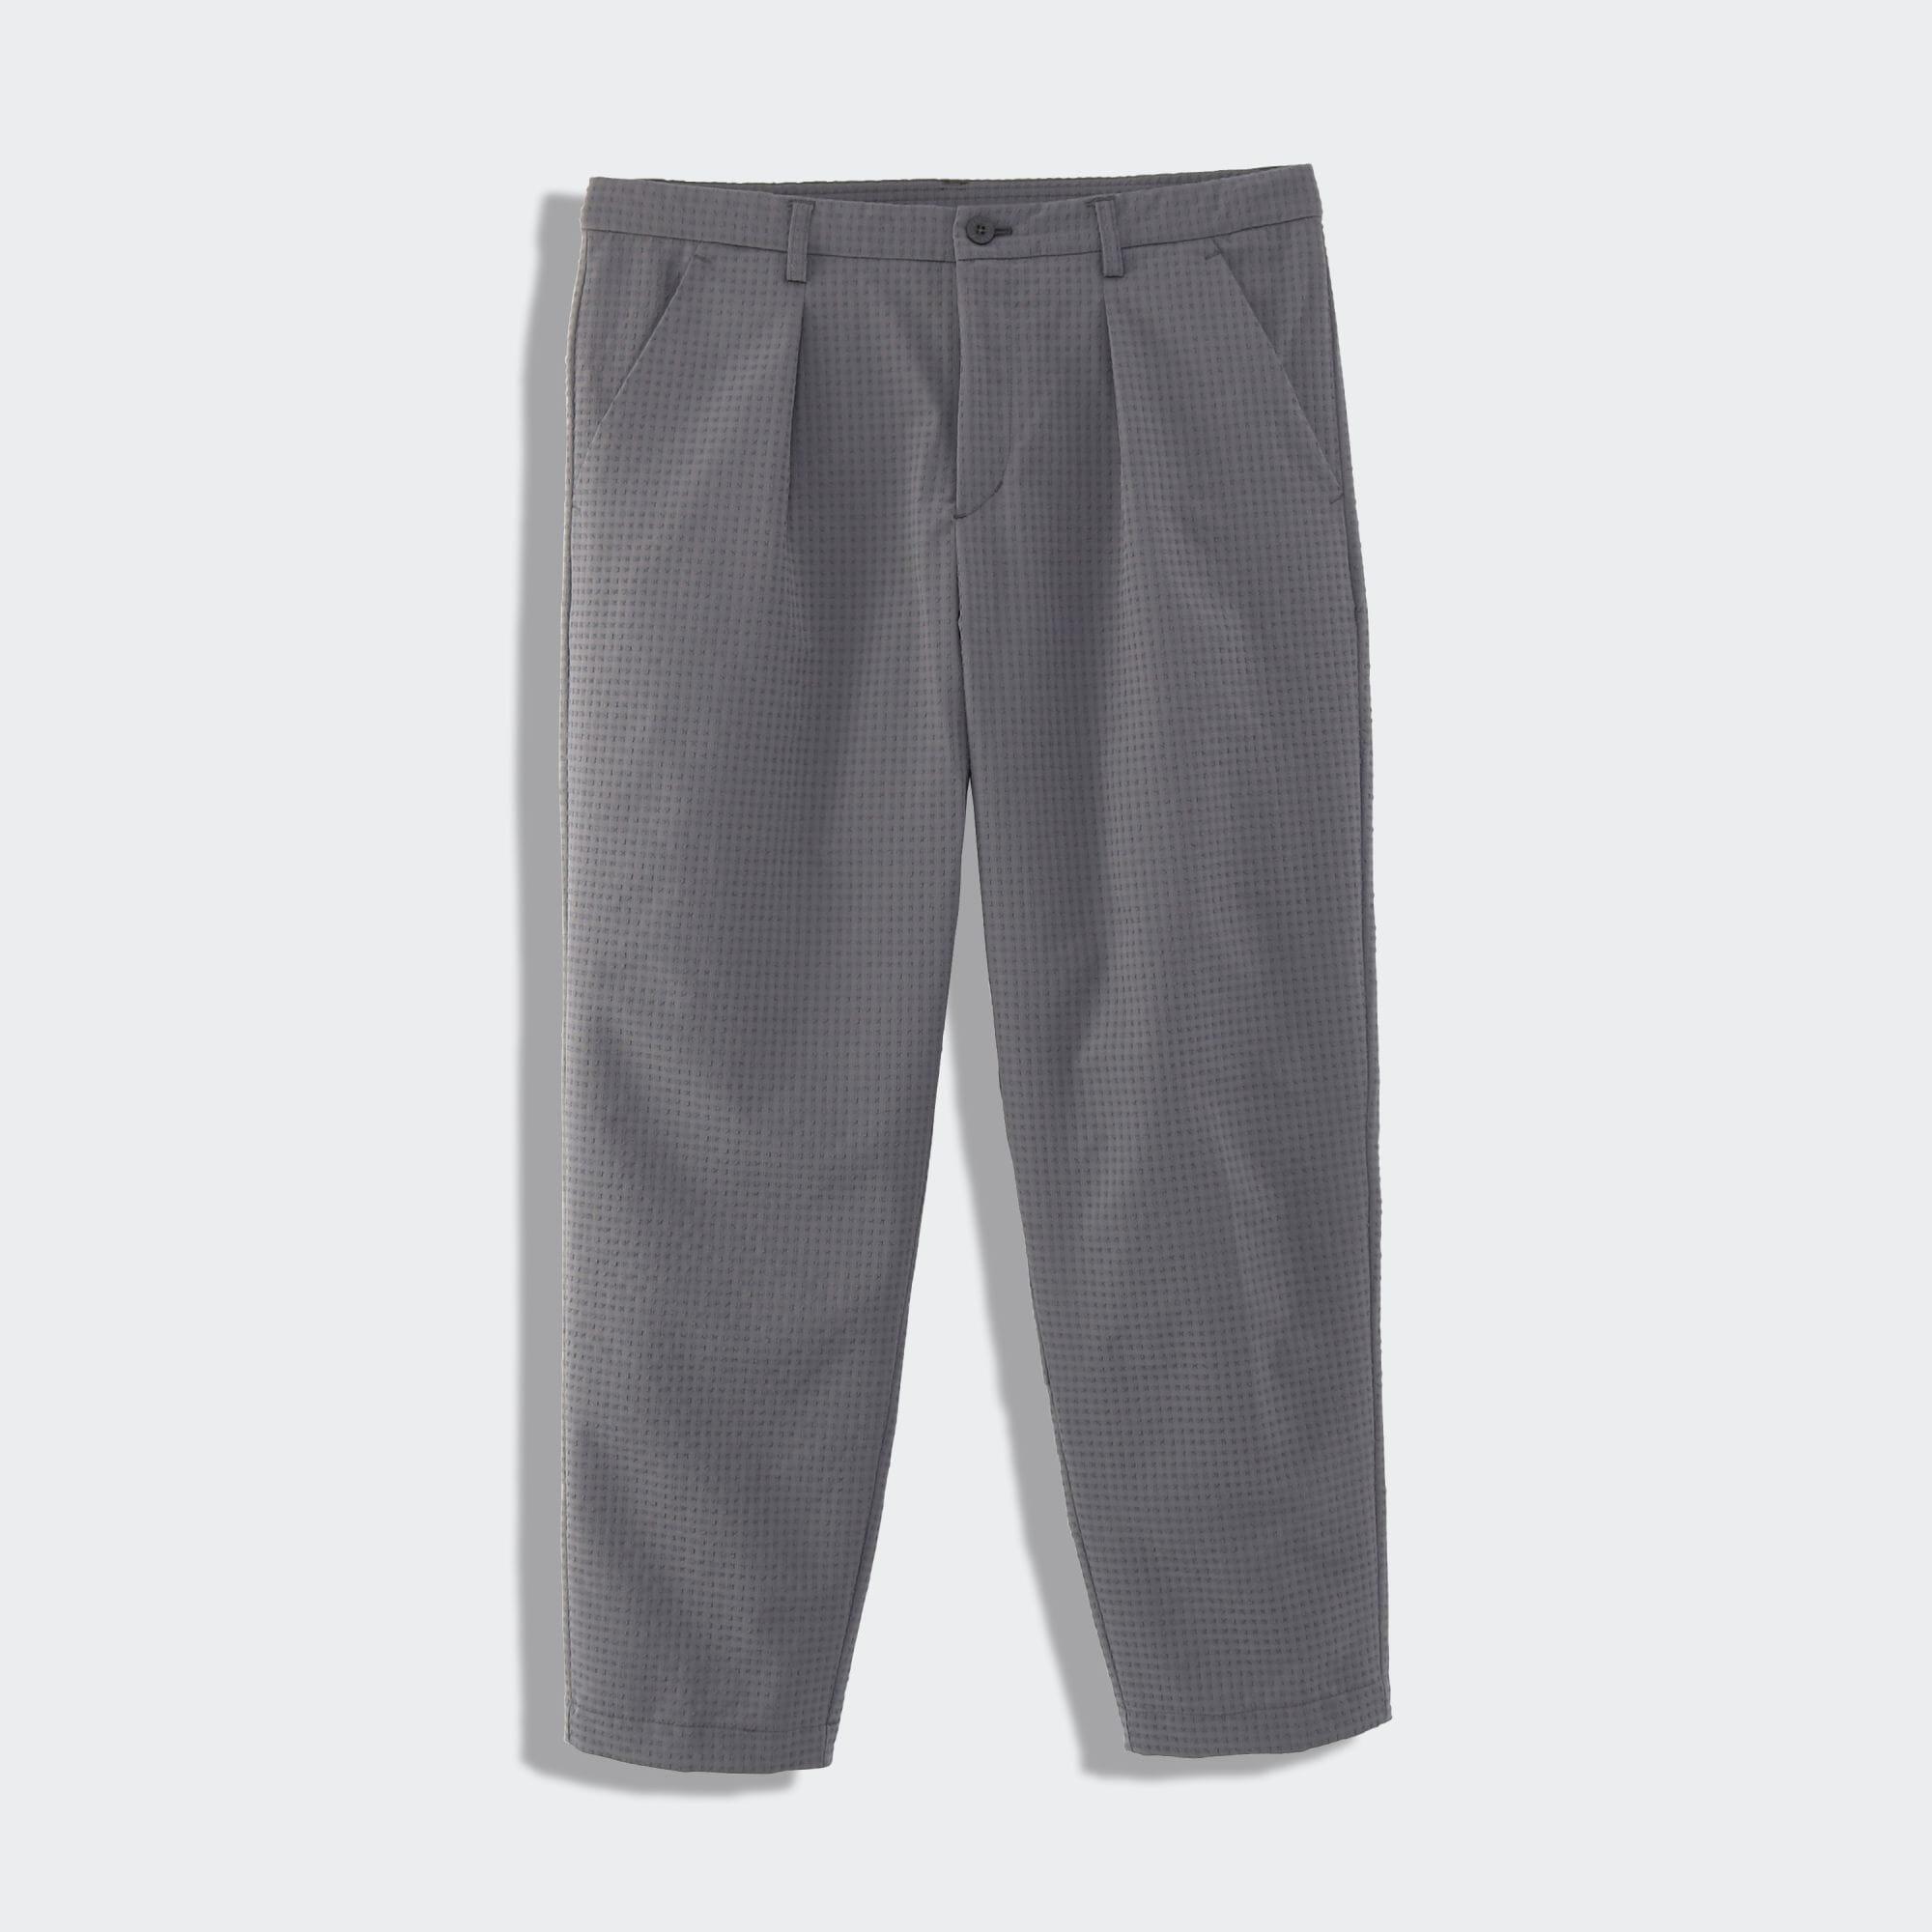 ISETAN / ICON スーツパンツ